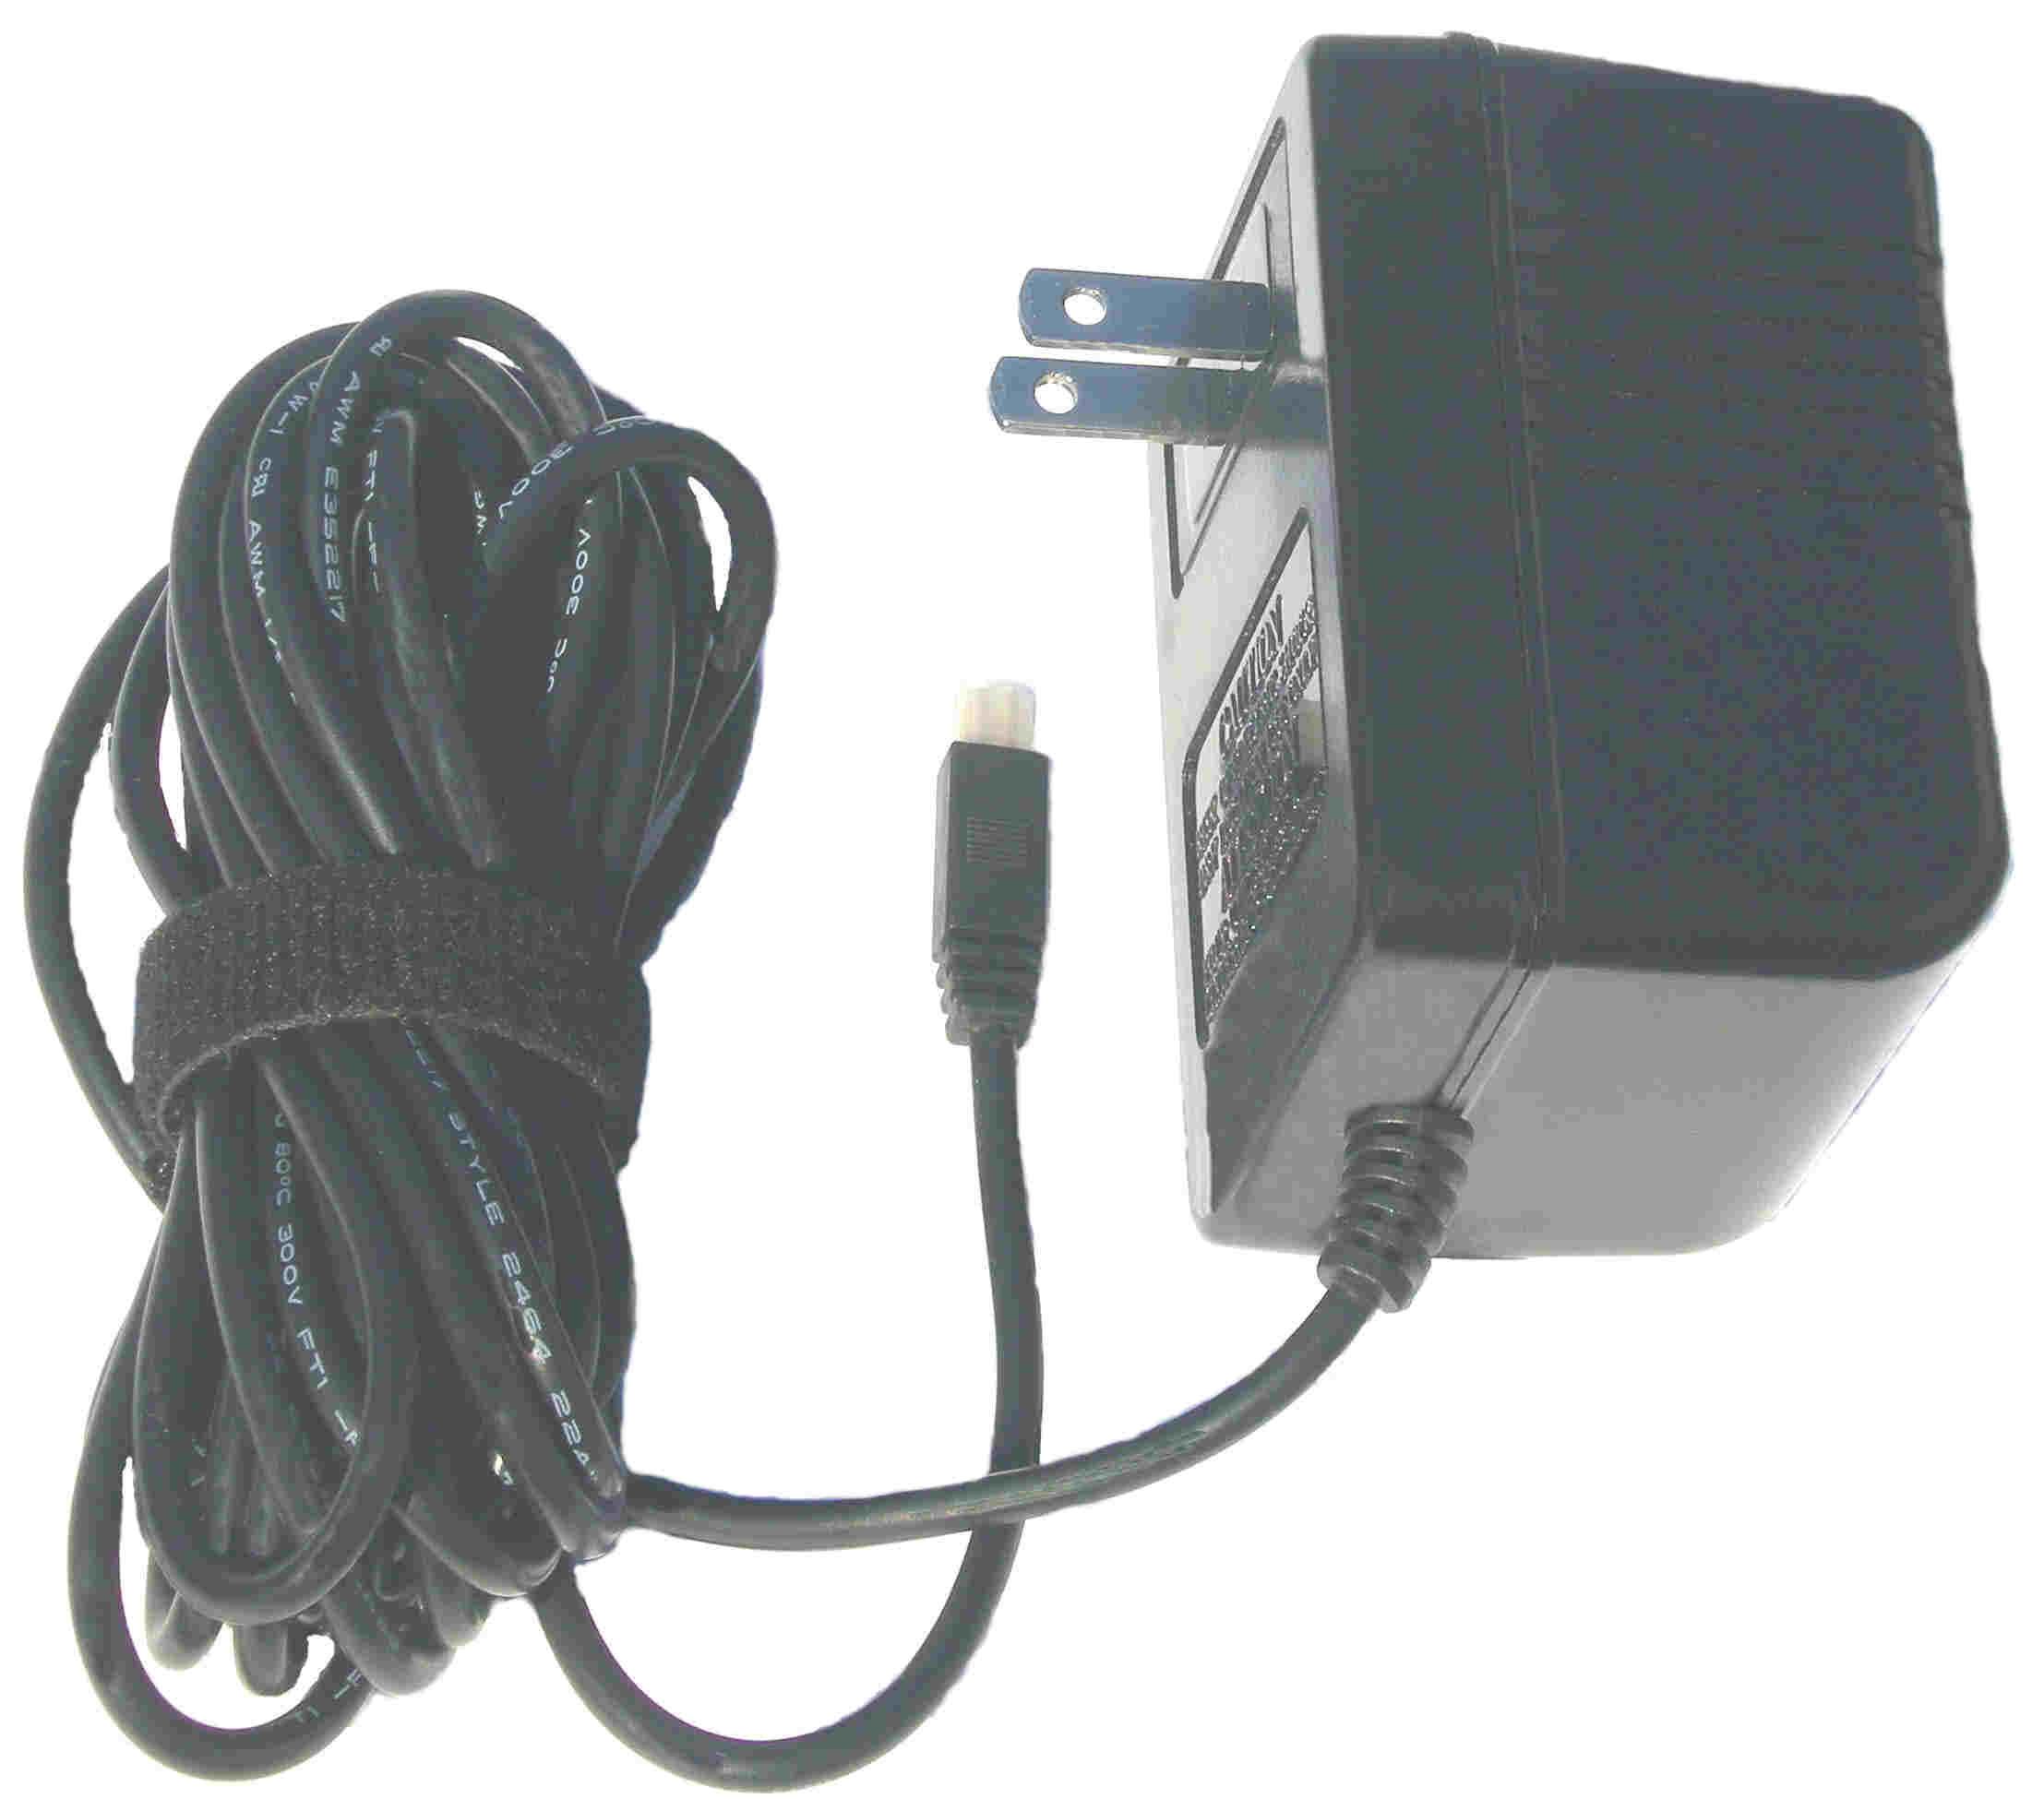 Be advised of the Atari 7800 clo